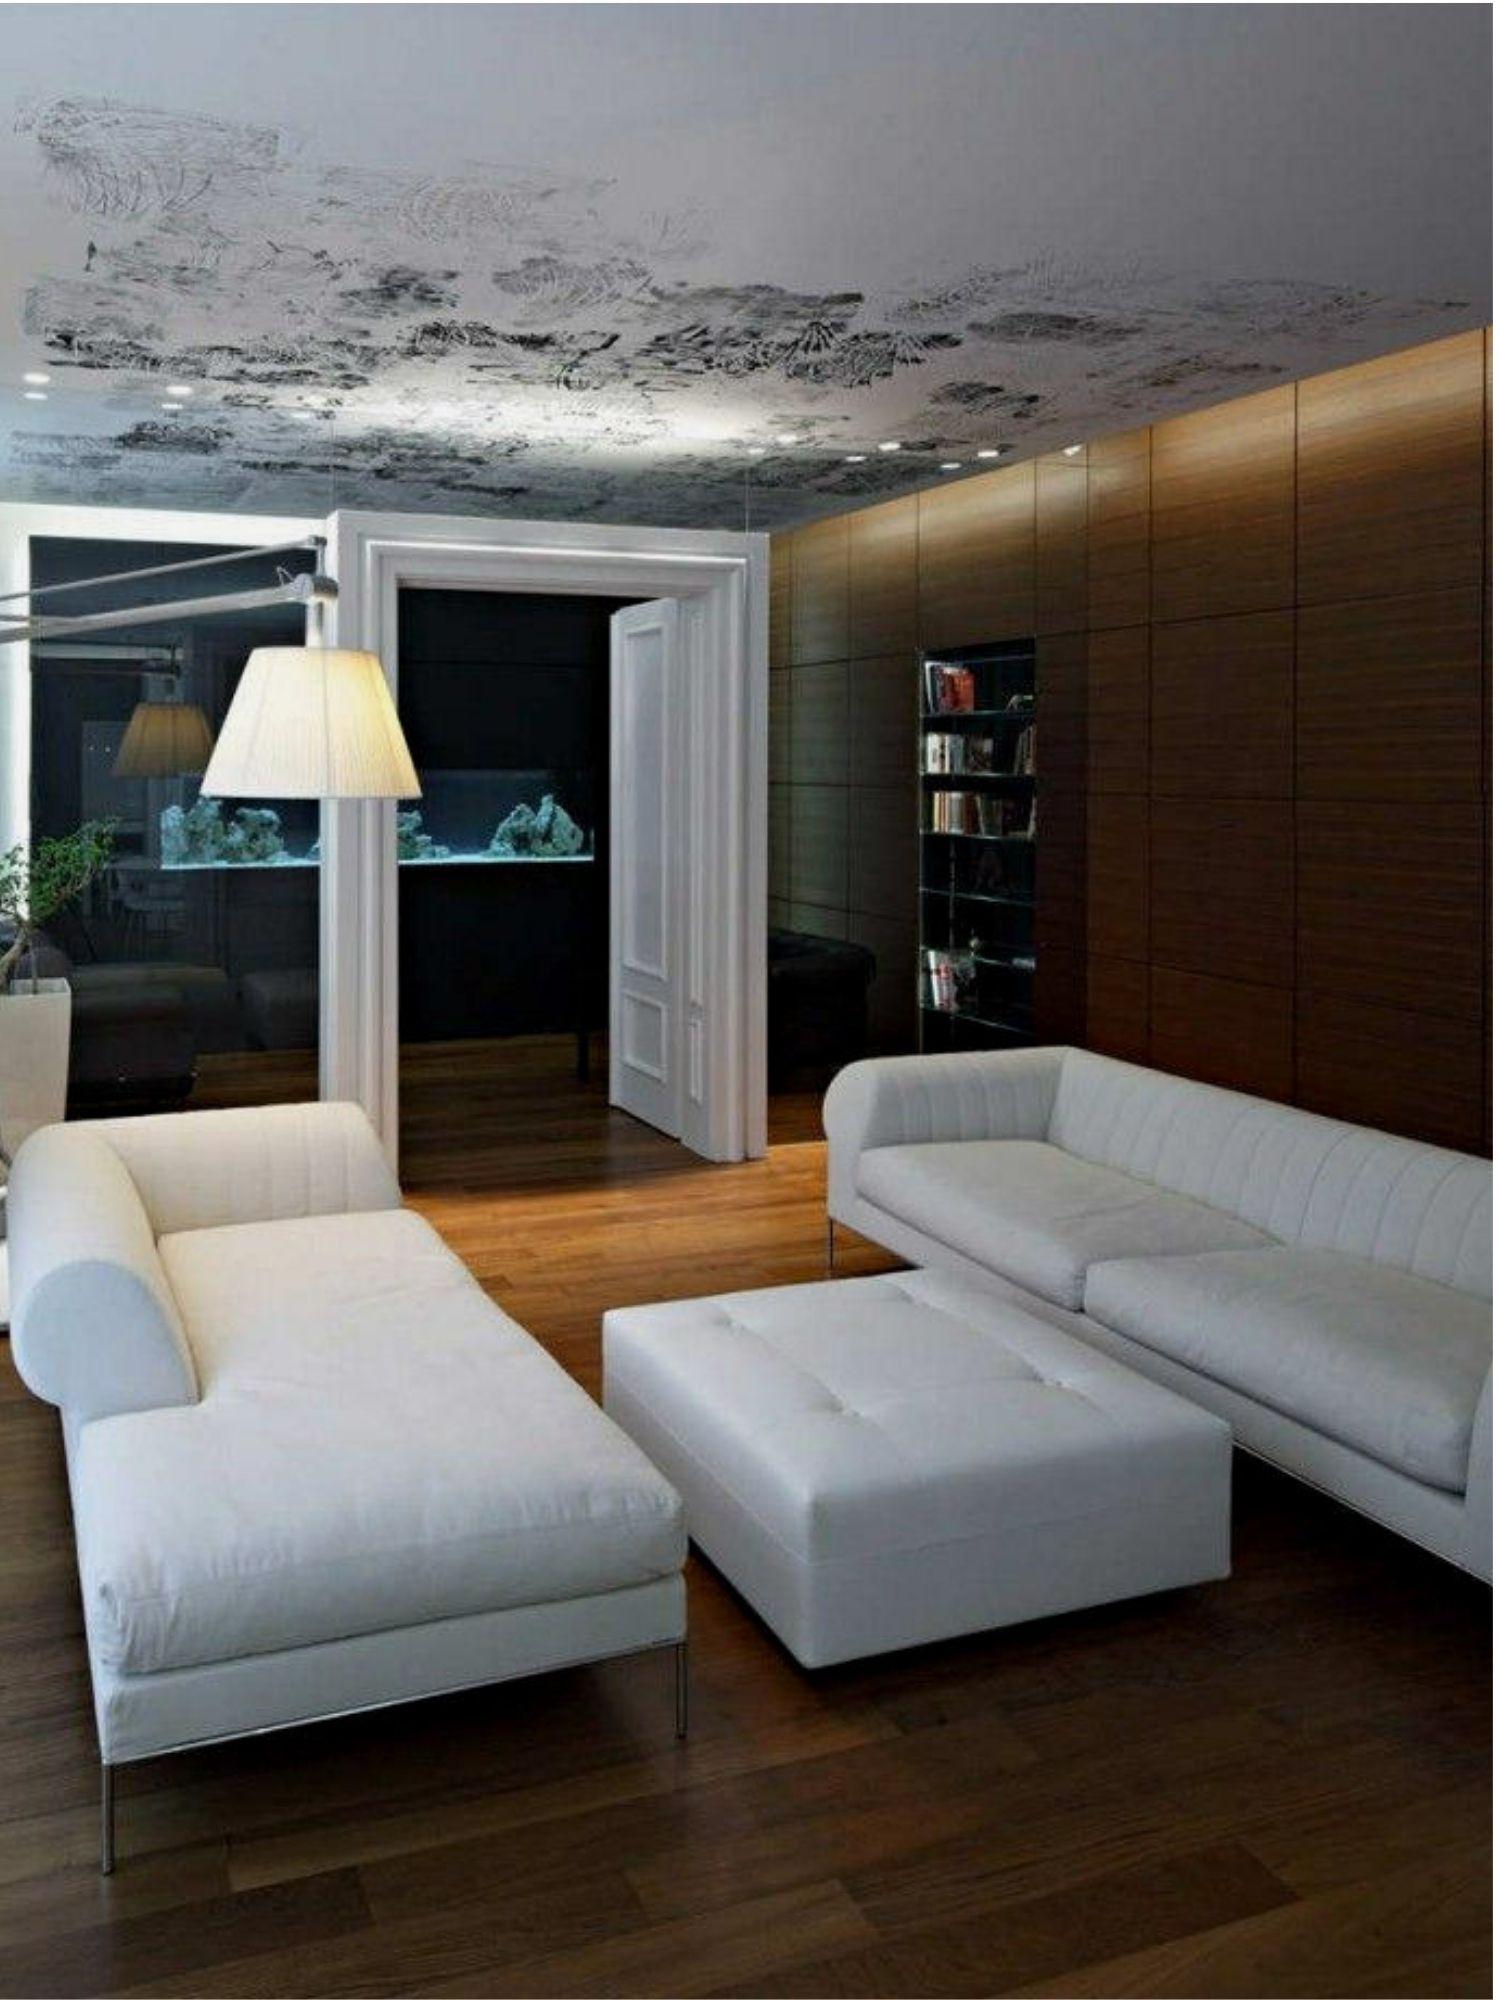 Top 7 Modern Interior Design Concepts Interior Design Modern Interior Design Interior Design Concepts